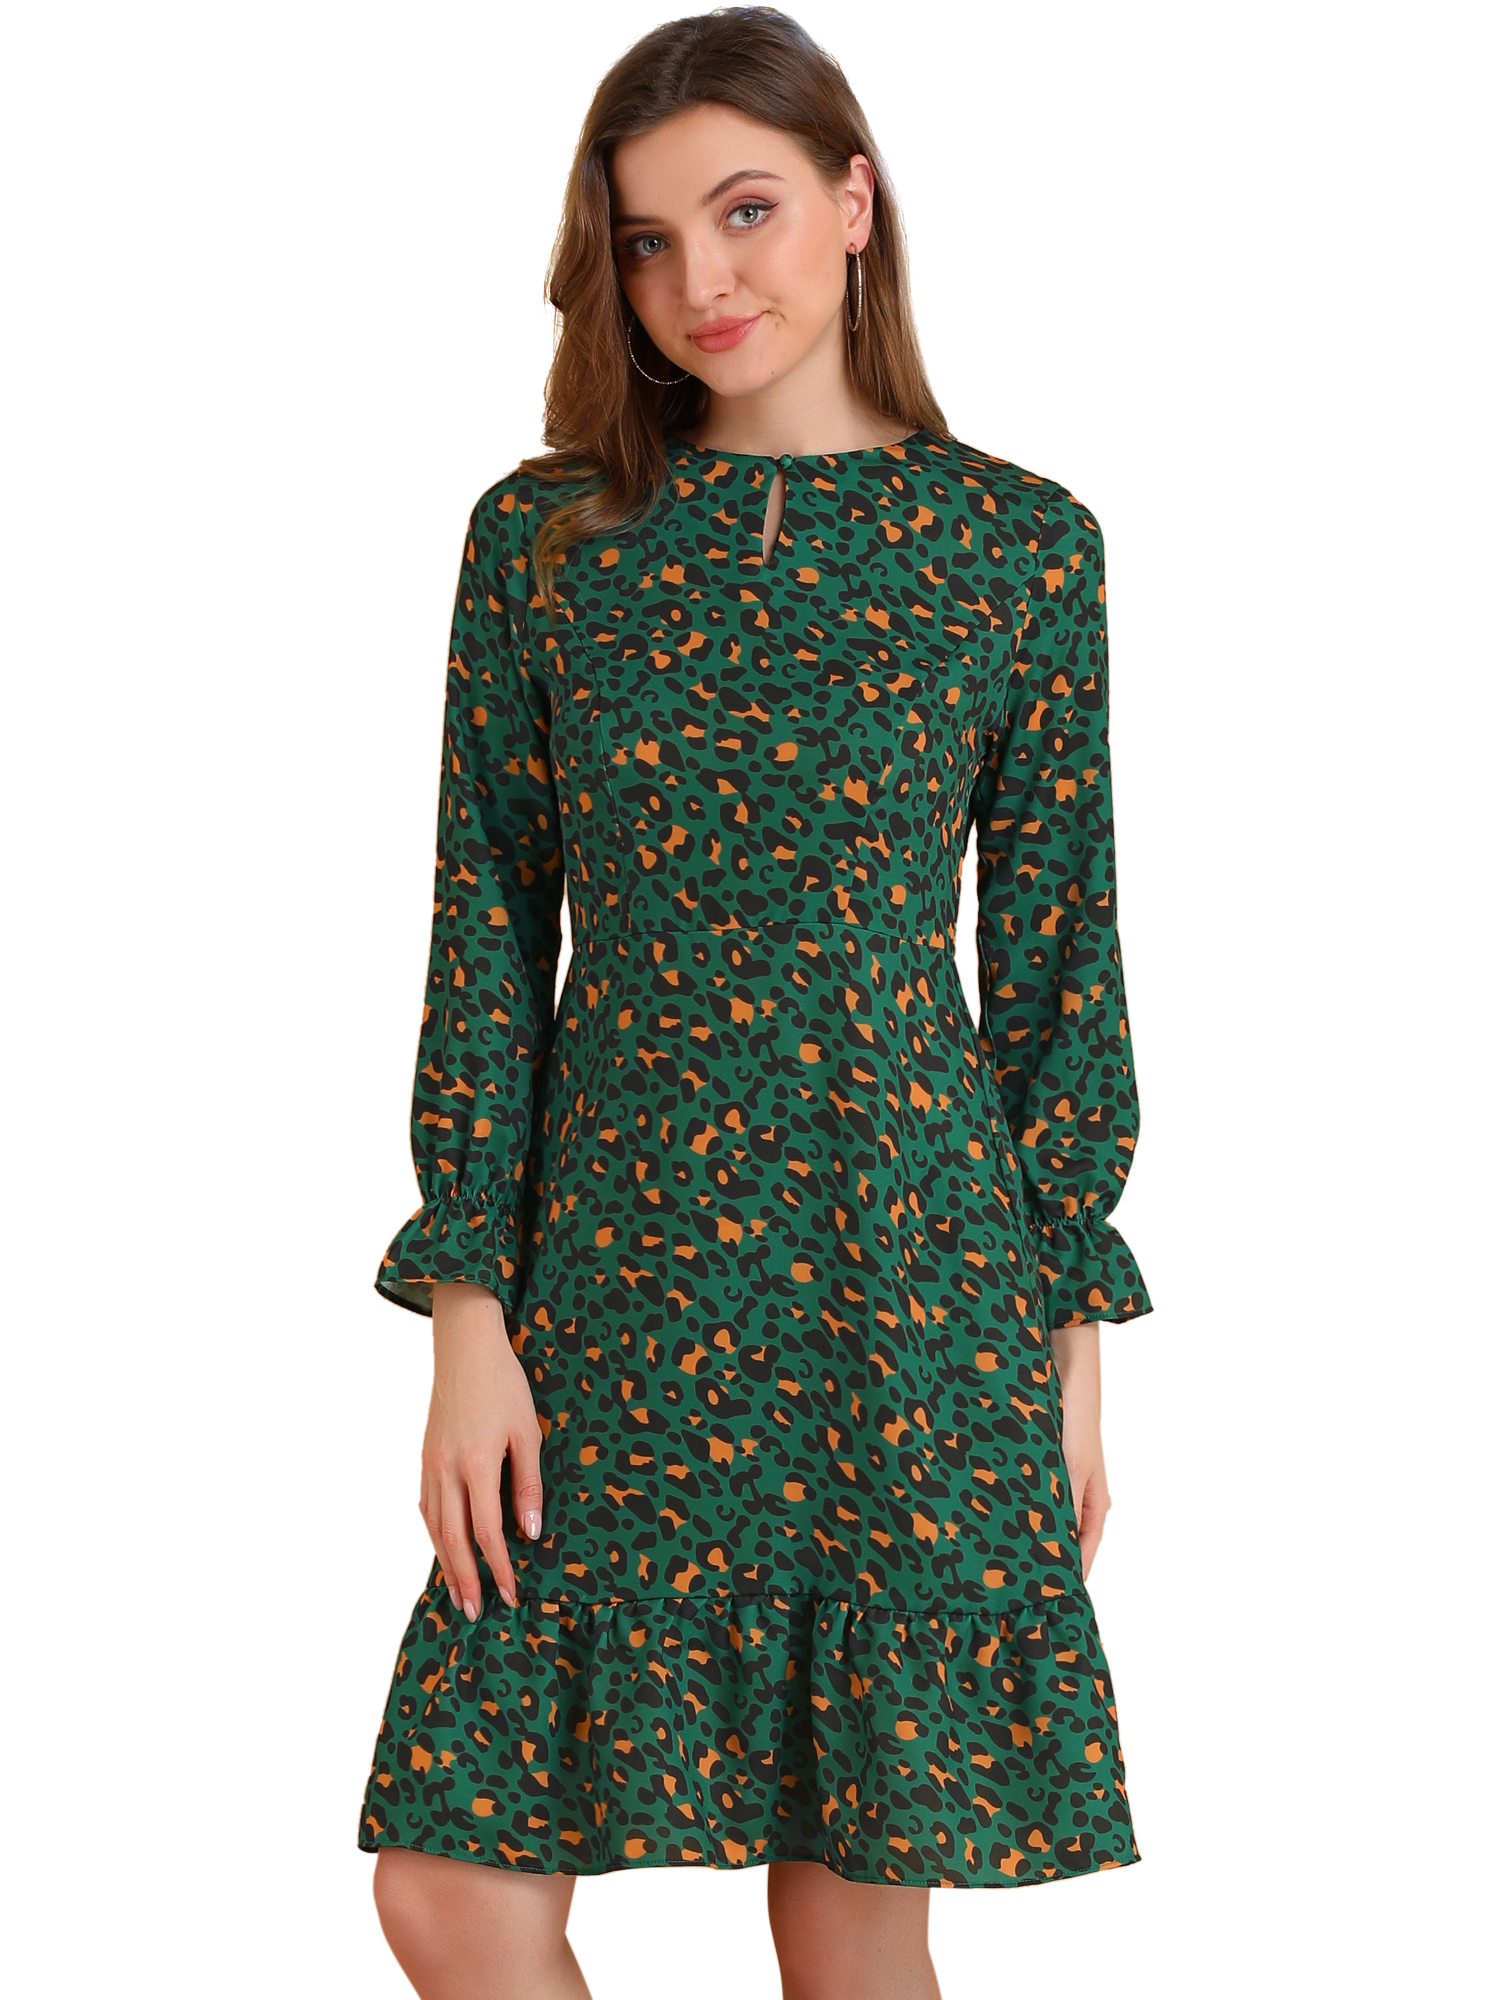 Women's Leopard Print Long Sleeve Keyhole Ruffle Hem Dress Green M (US 10)